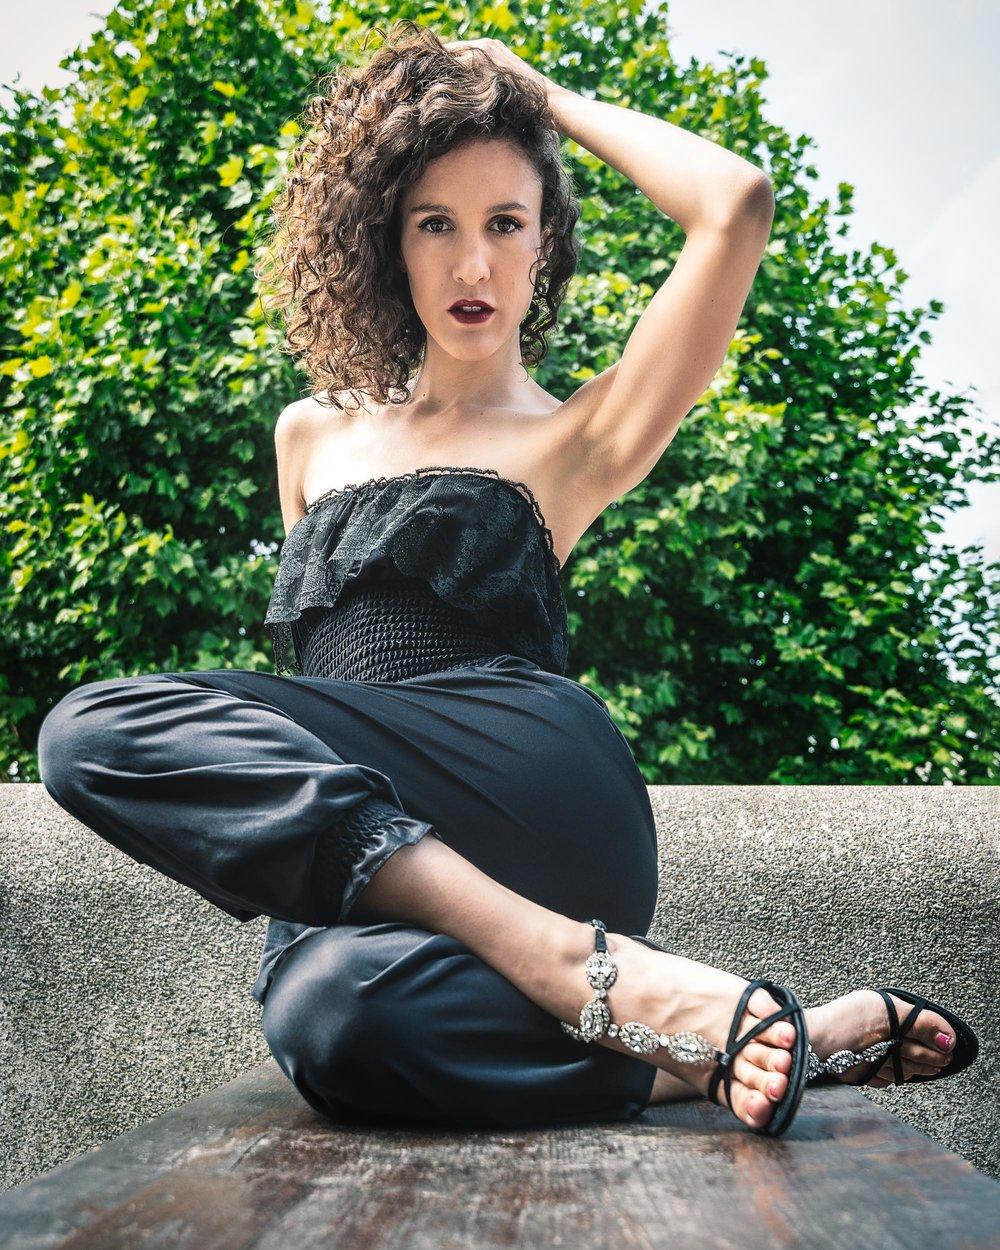 Rebecca-10Jun2018-053-toned.jpg